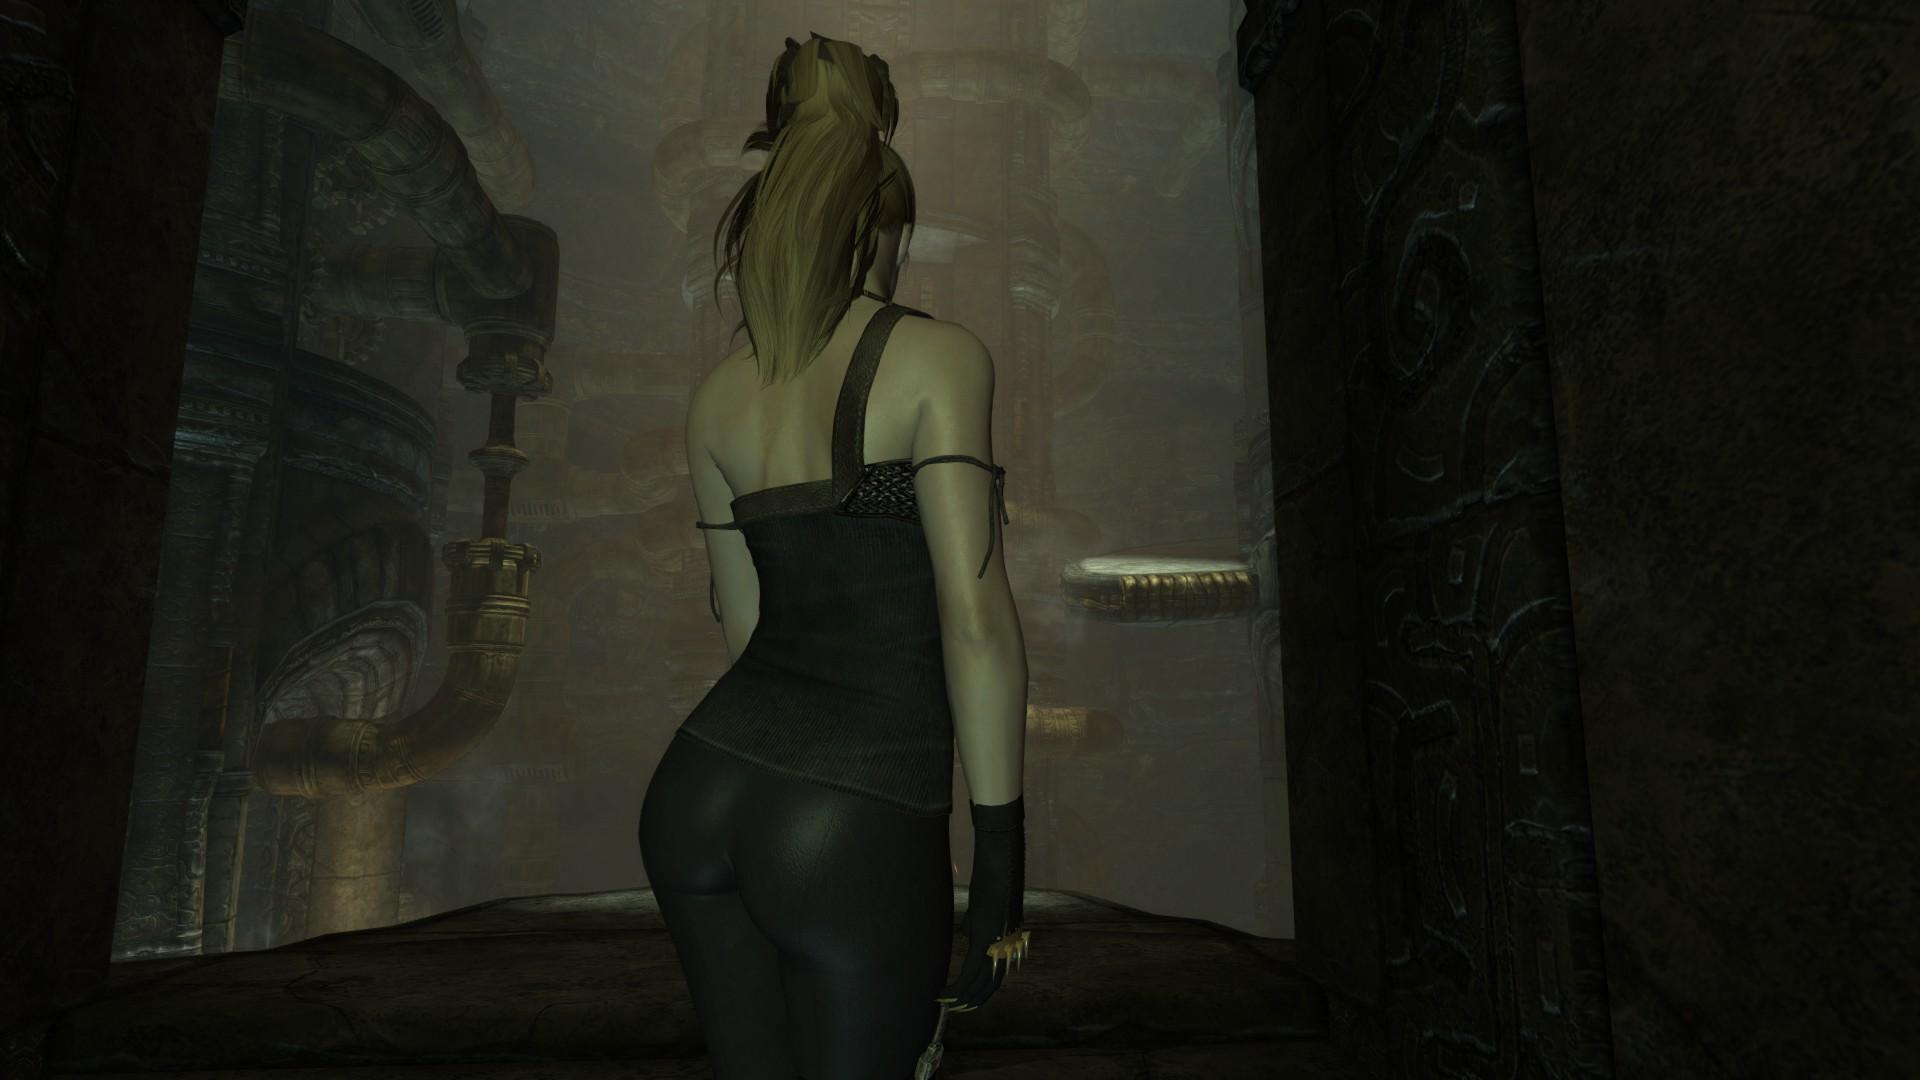 20180721192608_1.jpg - Elder Scrolls 5: Skyrim, the